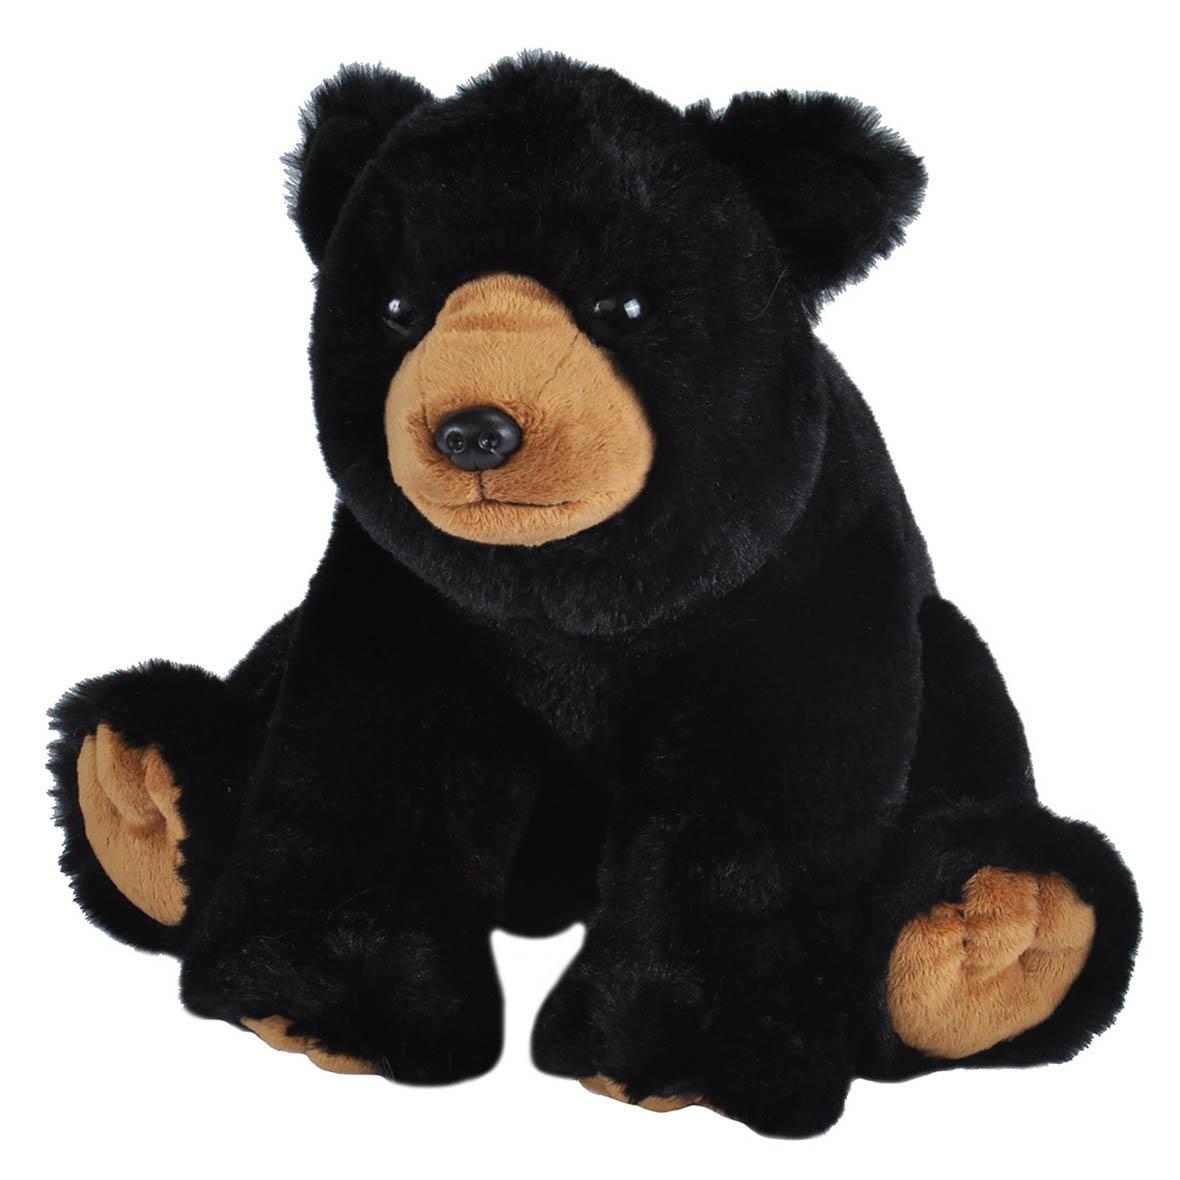 Sunbear Stuffed Animal, Black Bear Stuffed Animal Sporting Life Online